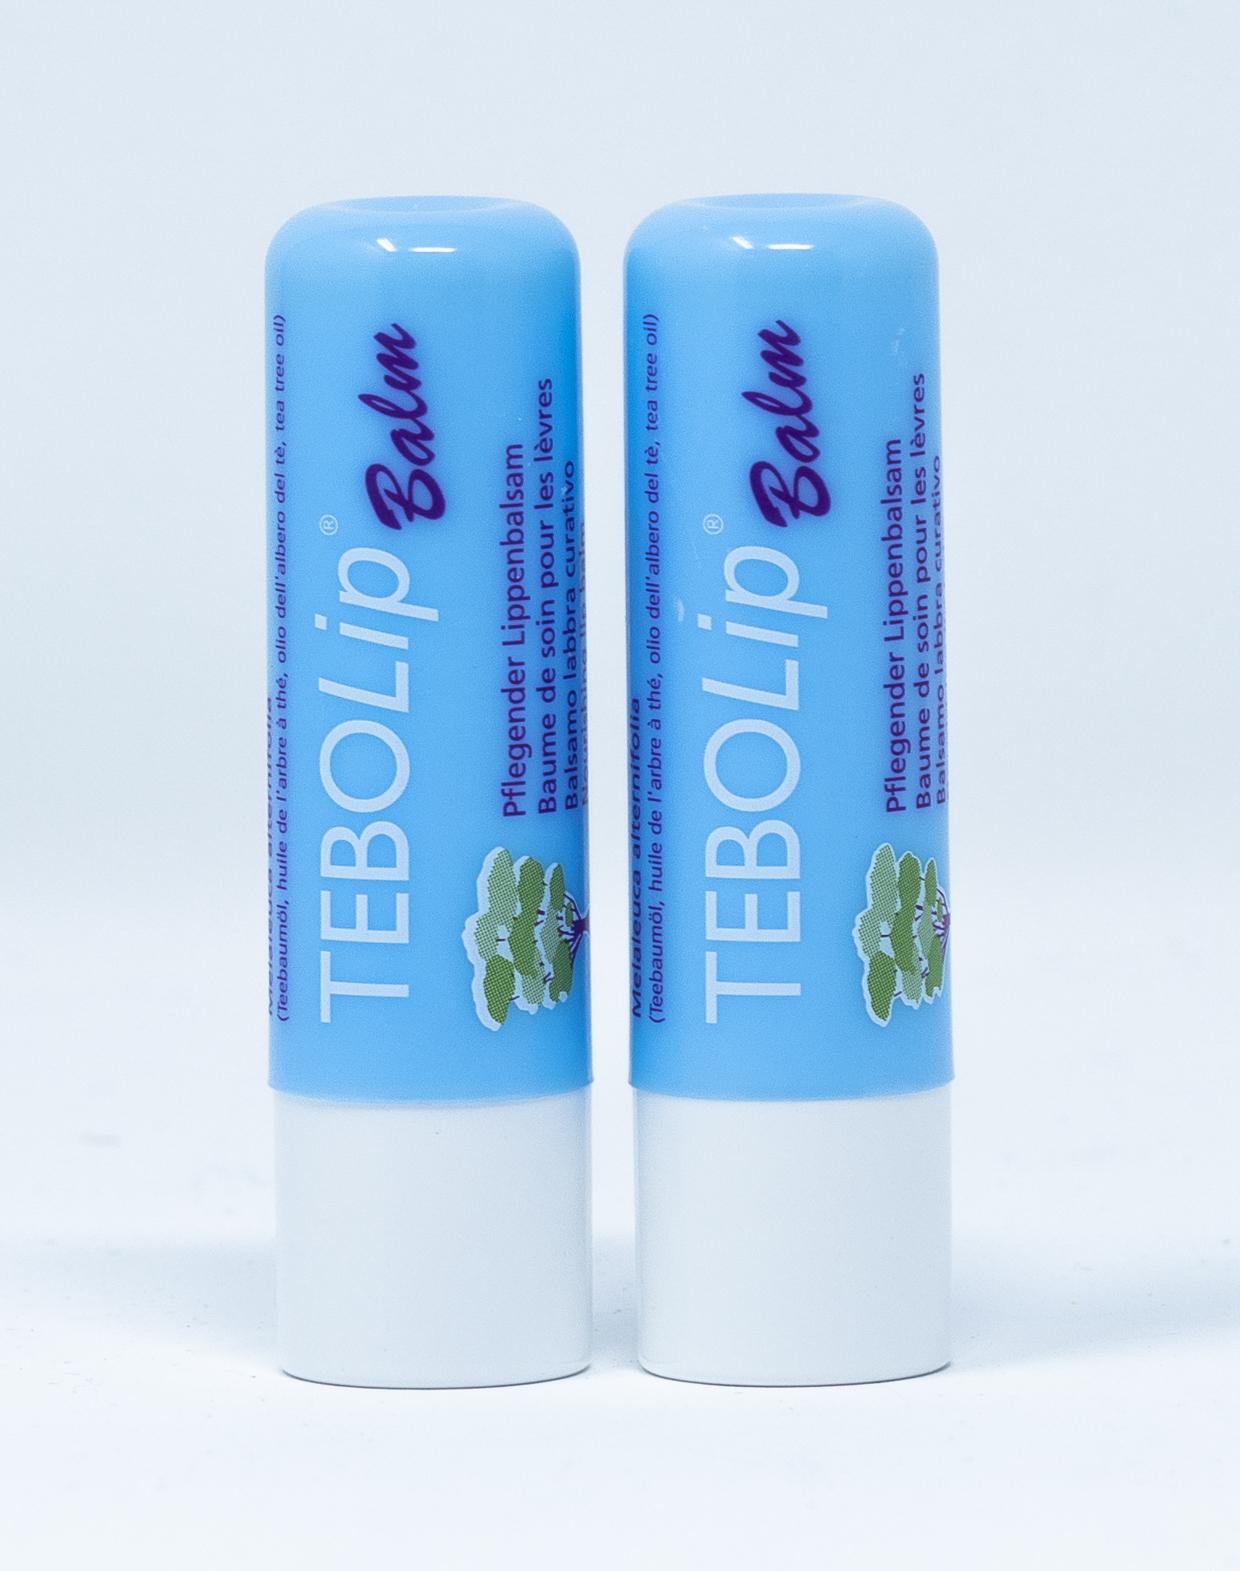 Tebodont Tebo Lip Balm Duo Stick Balsamo Labbra  – 2 pz